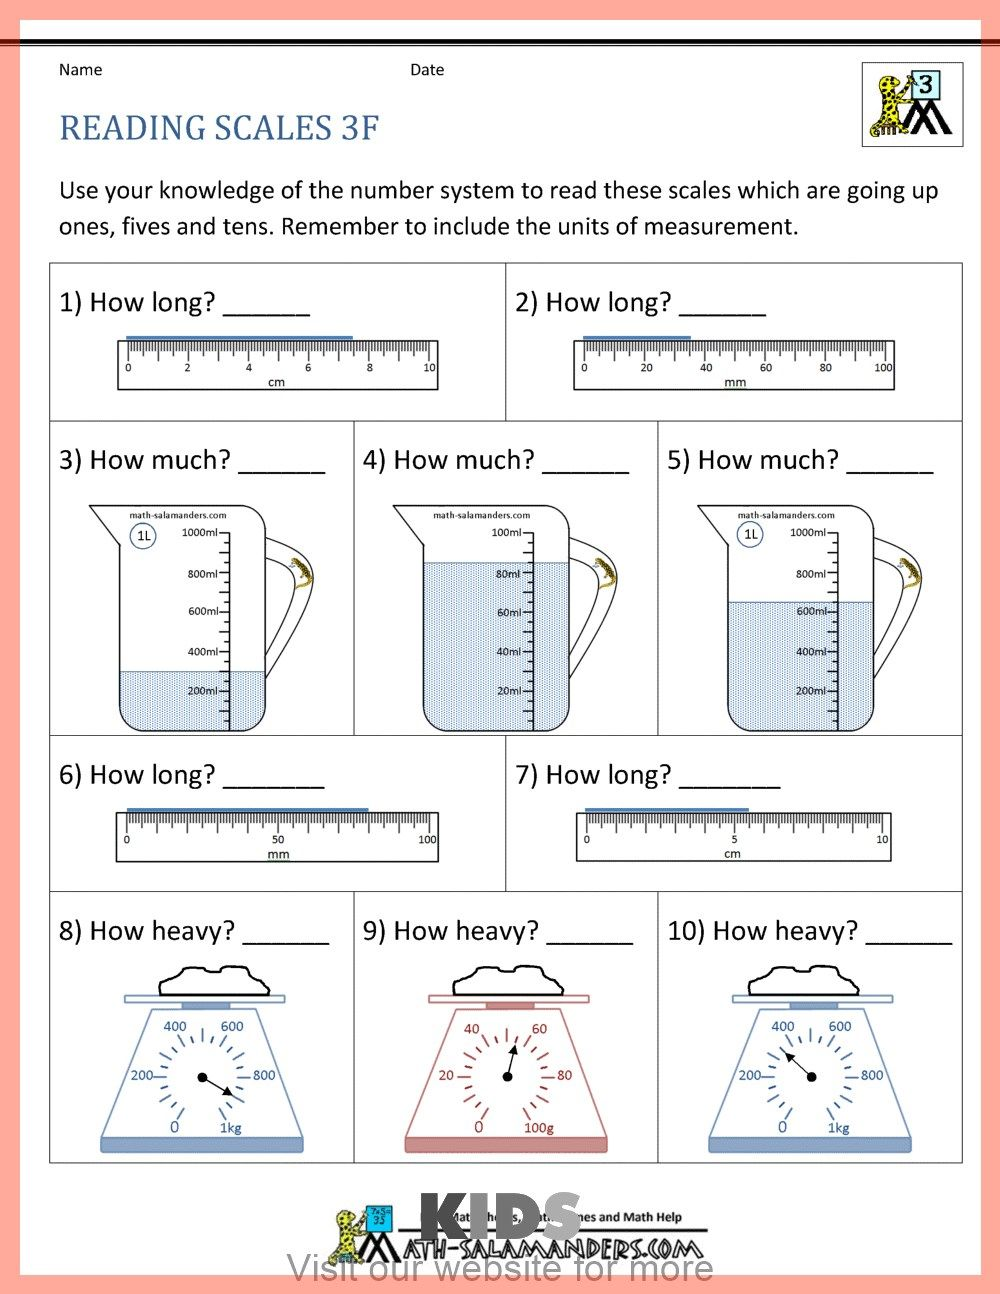 Preschool Coloring Pages Alphabet In 2020 Measurement Worksheets 4th Grade Math Worksheets Third Grade Math Worksheets